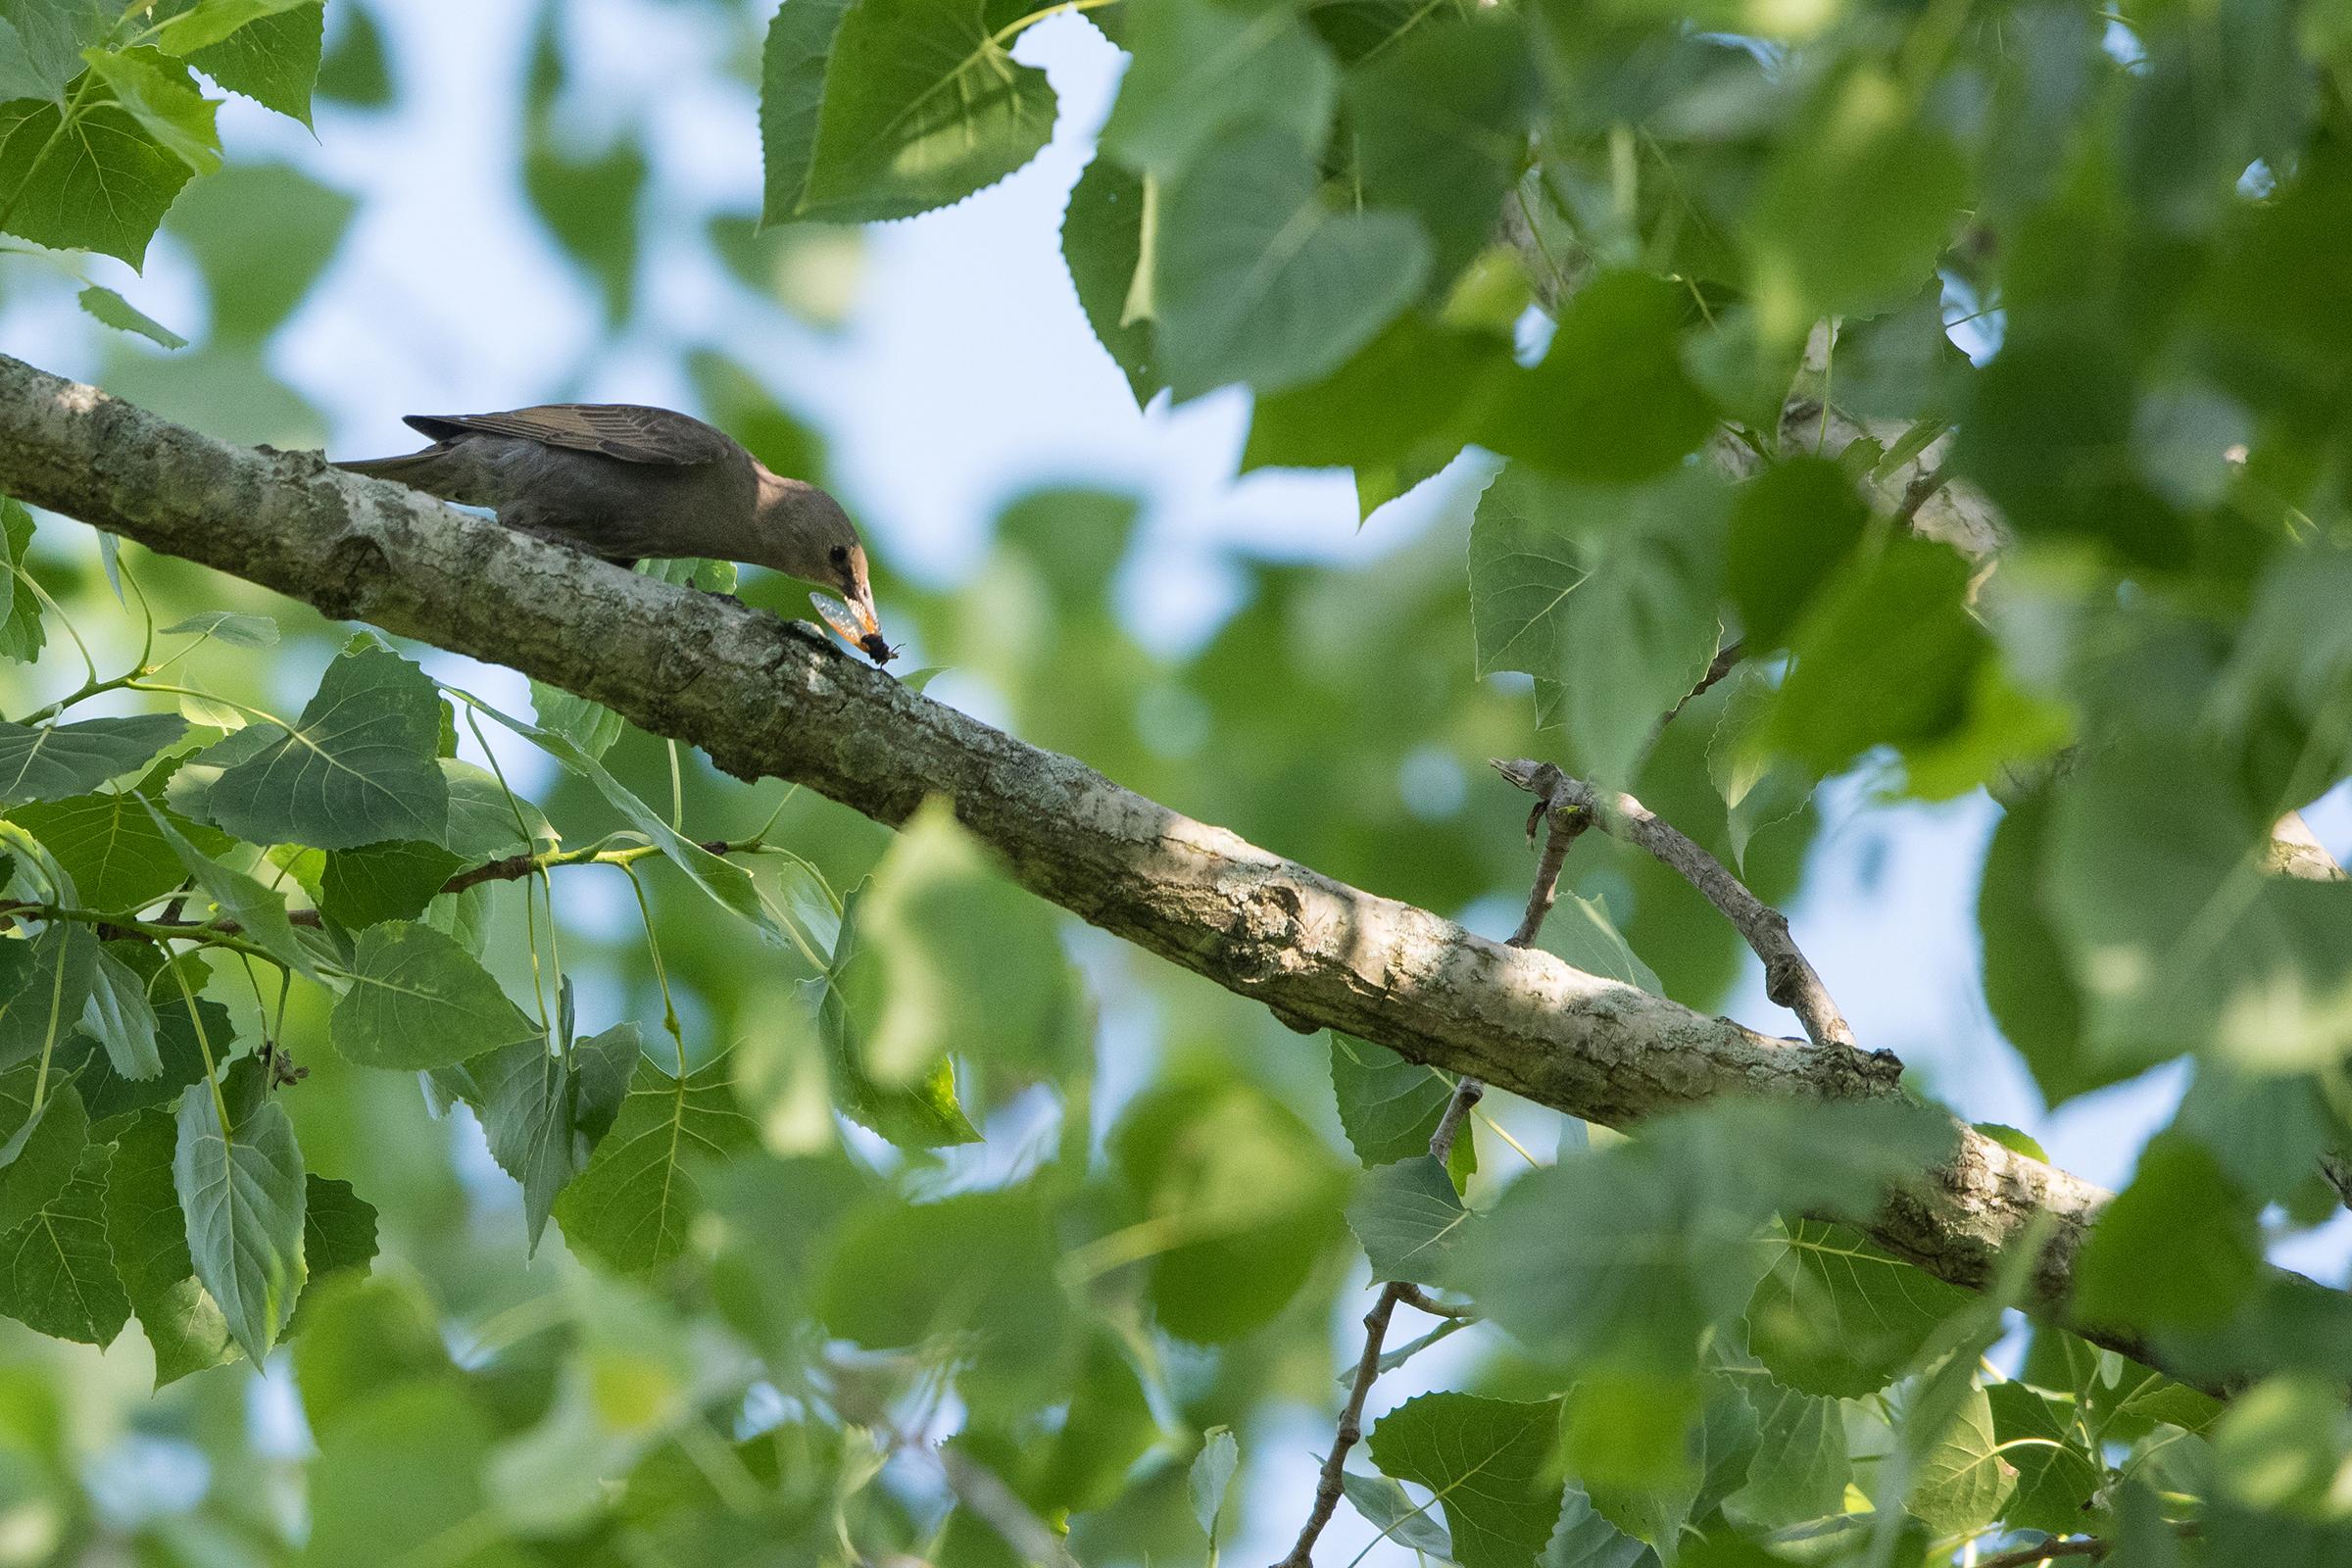 A juvenile European starling subdues a Brood X cicada near Cincinnati, Ohio in June of 2021.